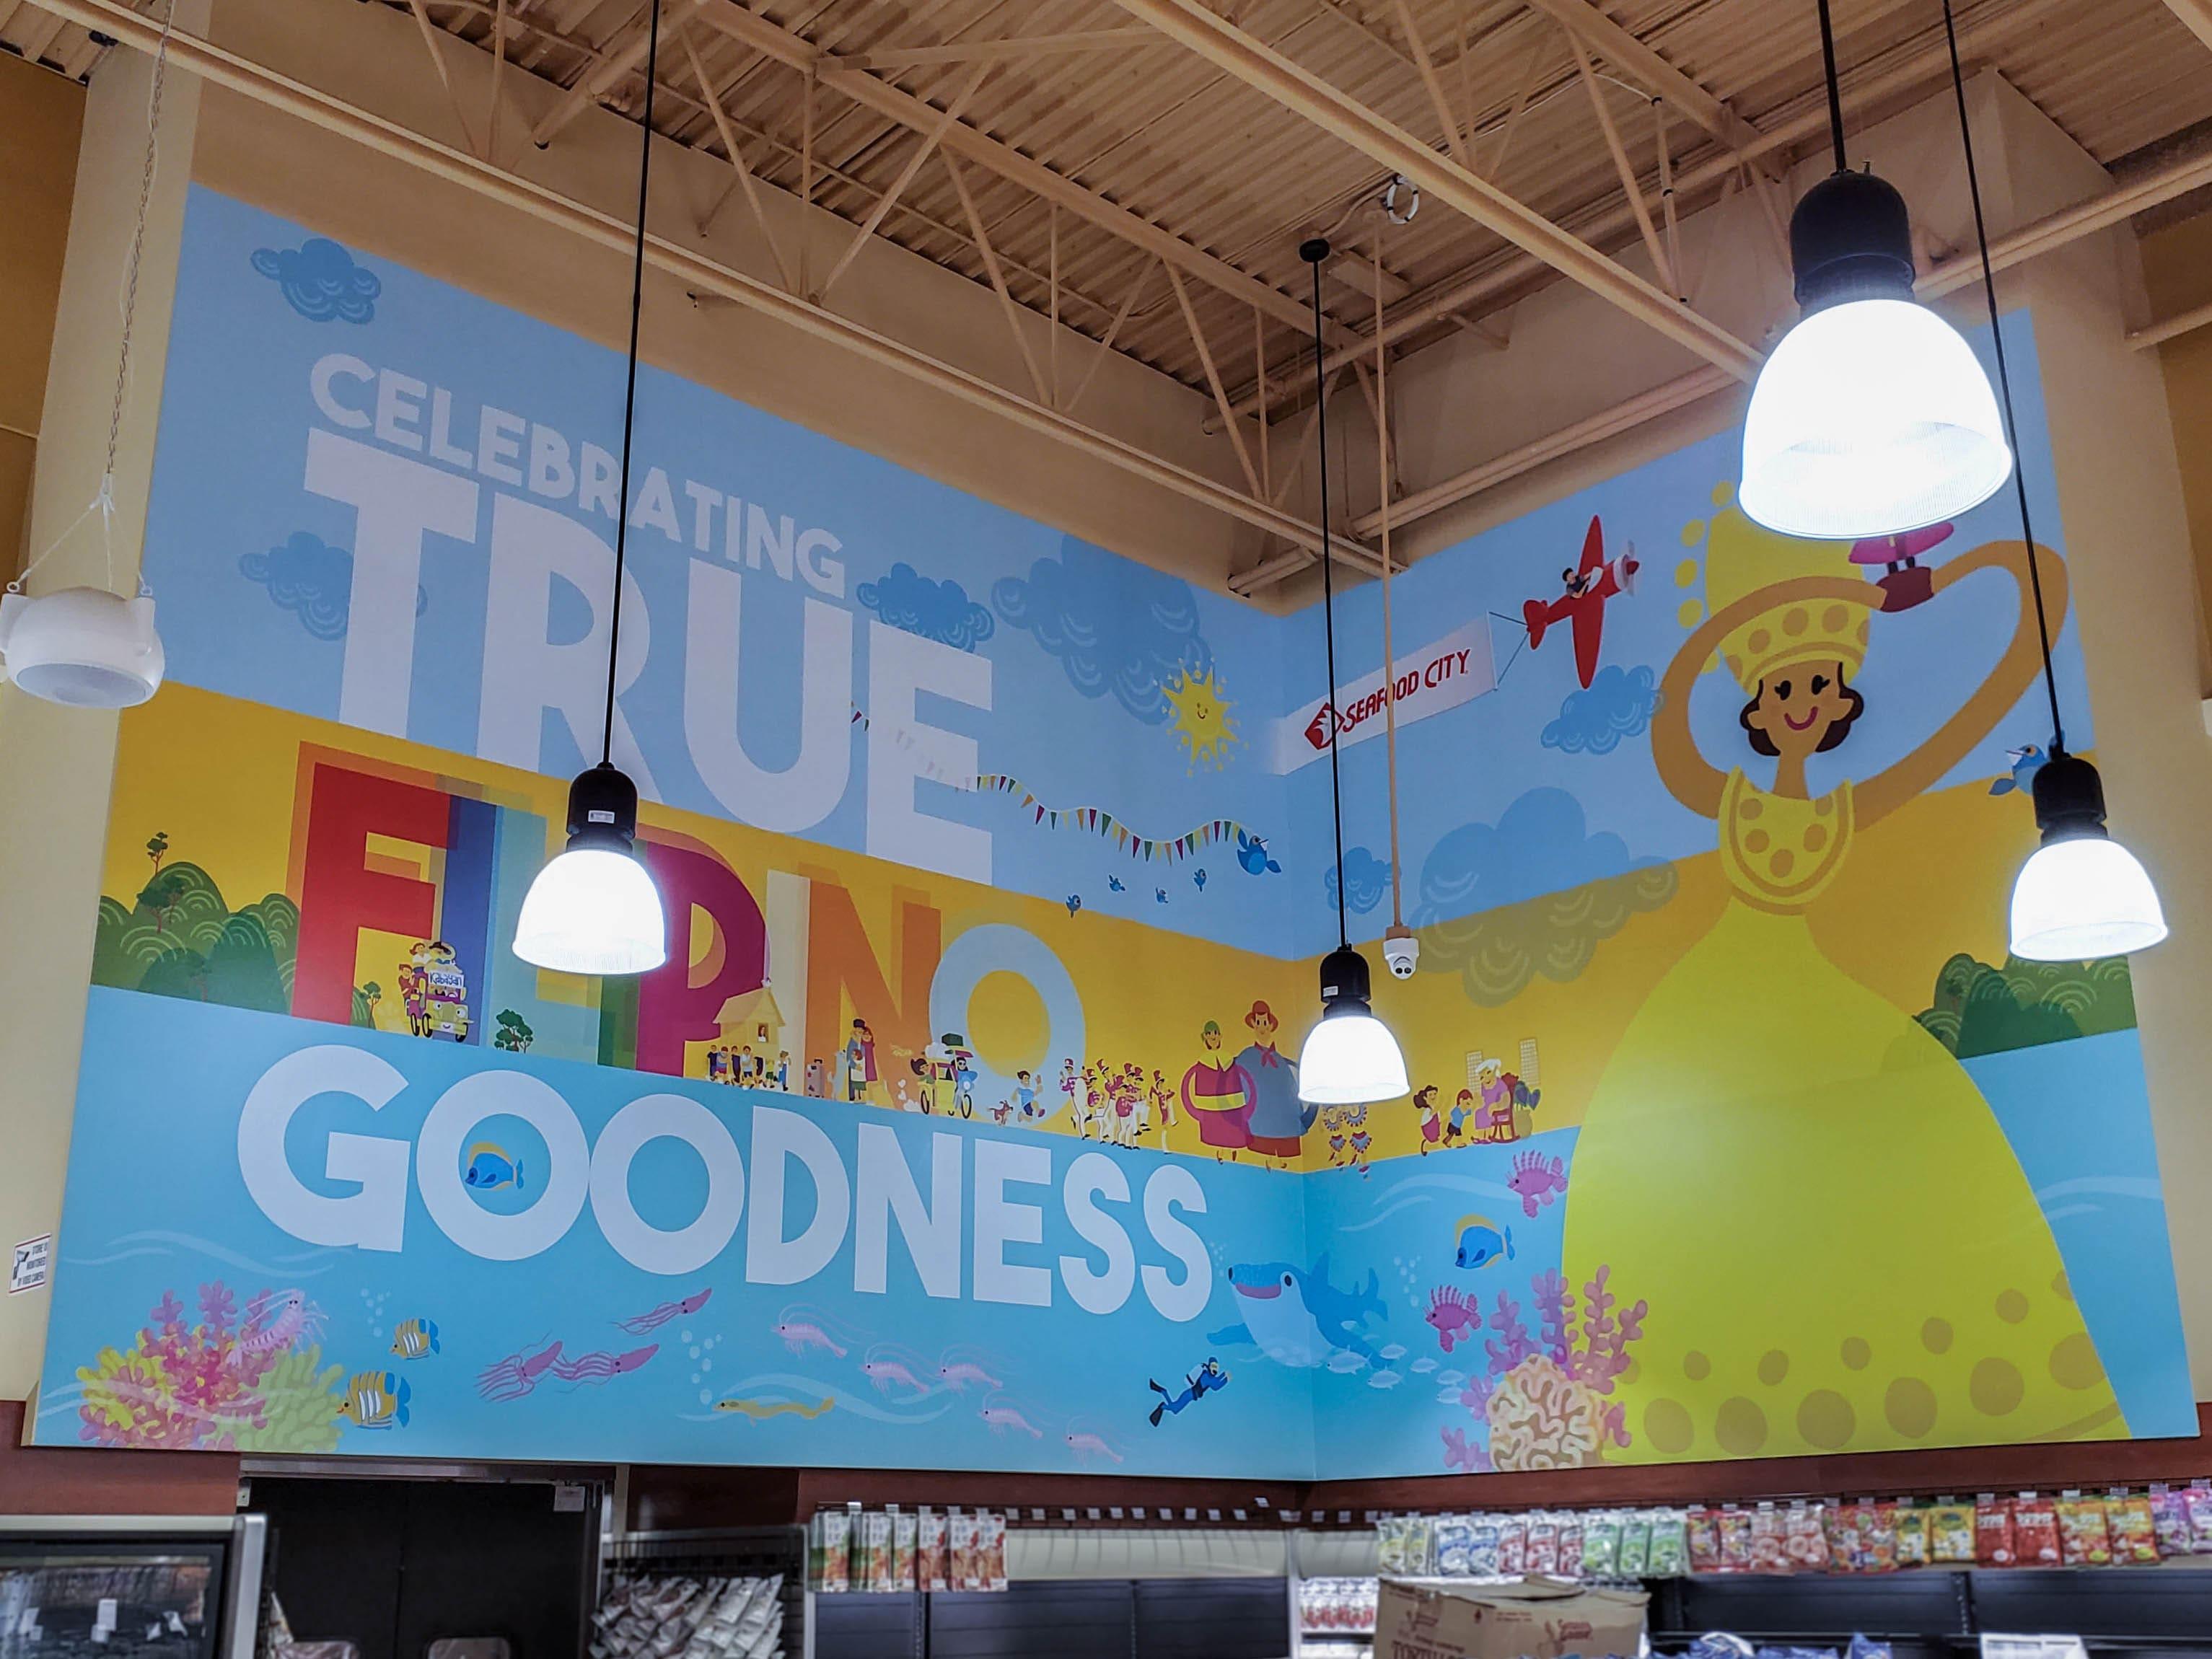 Seafood City Filipino goodness wall mural.